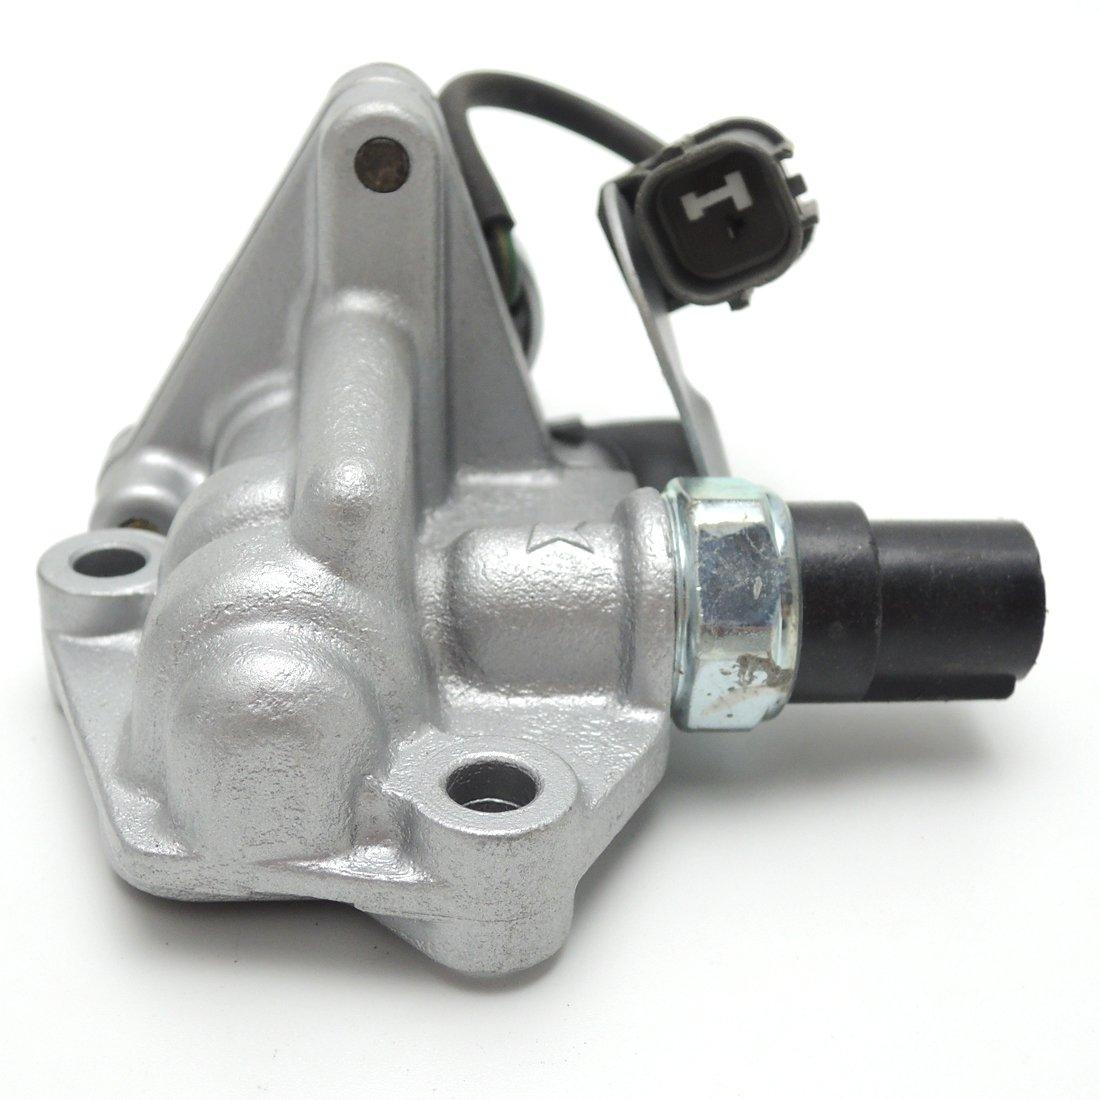 Amazon.com: VTEC Transmission Shift Control Solenoid Spool Valve  15810-PAA-A02 For Honda Accord Odyssey: Automotive